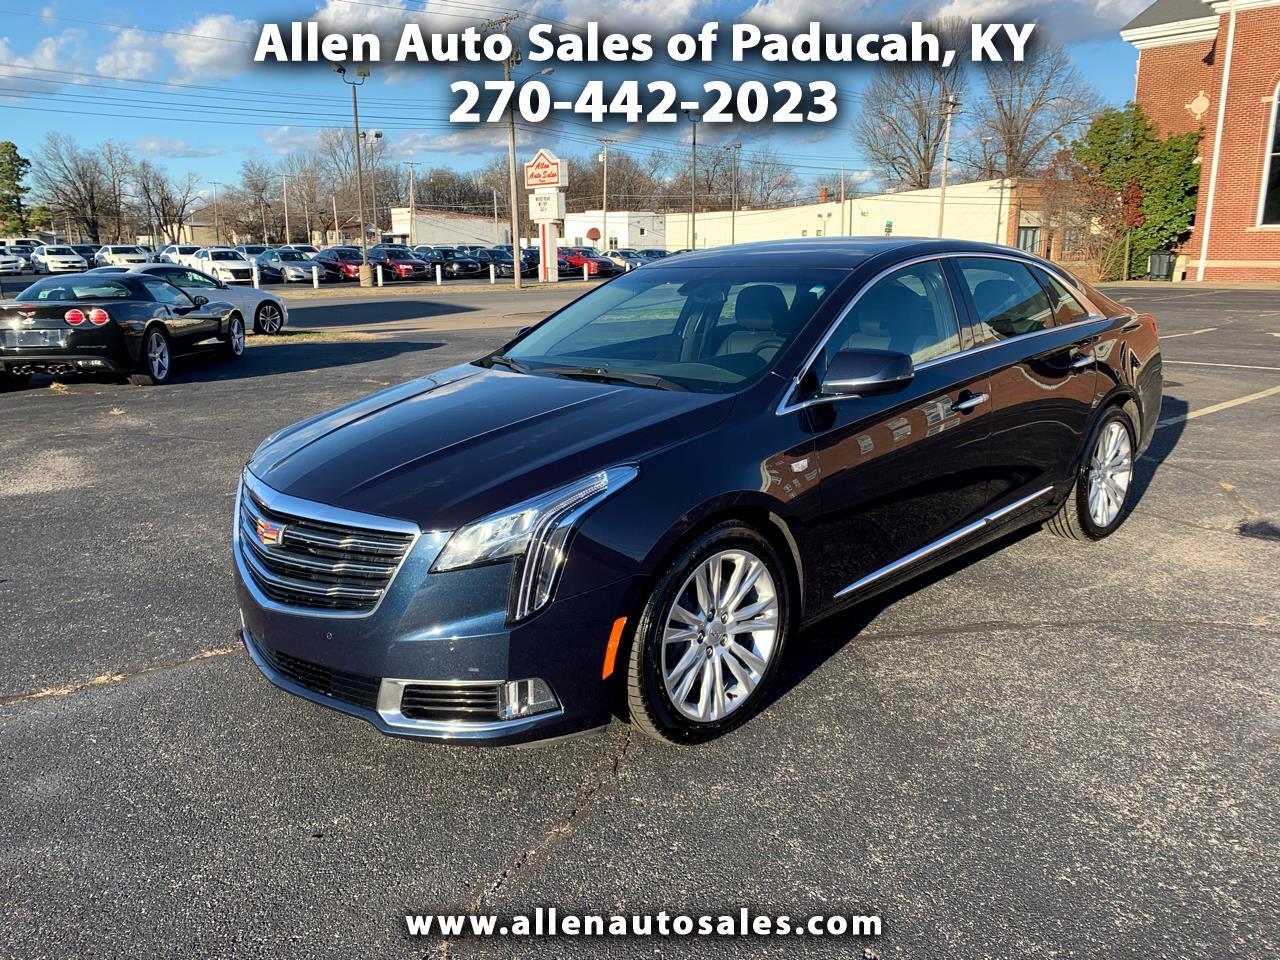 2018 Cadillac XTS 4dr Sdn Luxury AWD